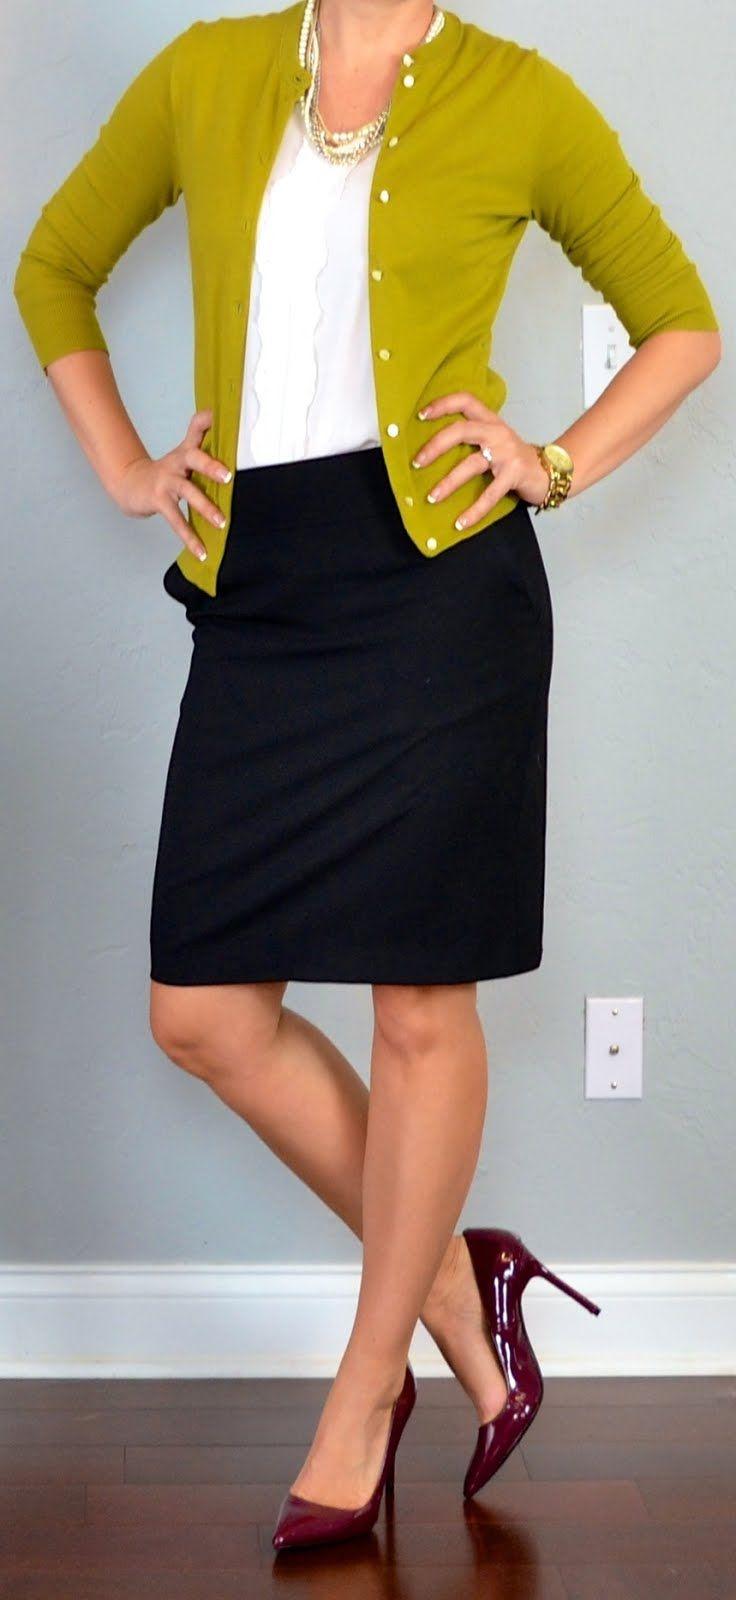 Outfit Posts: green/mustard cardigan, black pencil skirt, burgundy pumps    outfitposts.blogspot.com